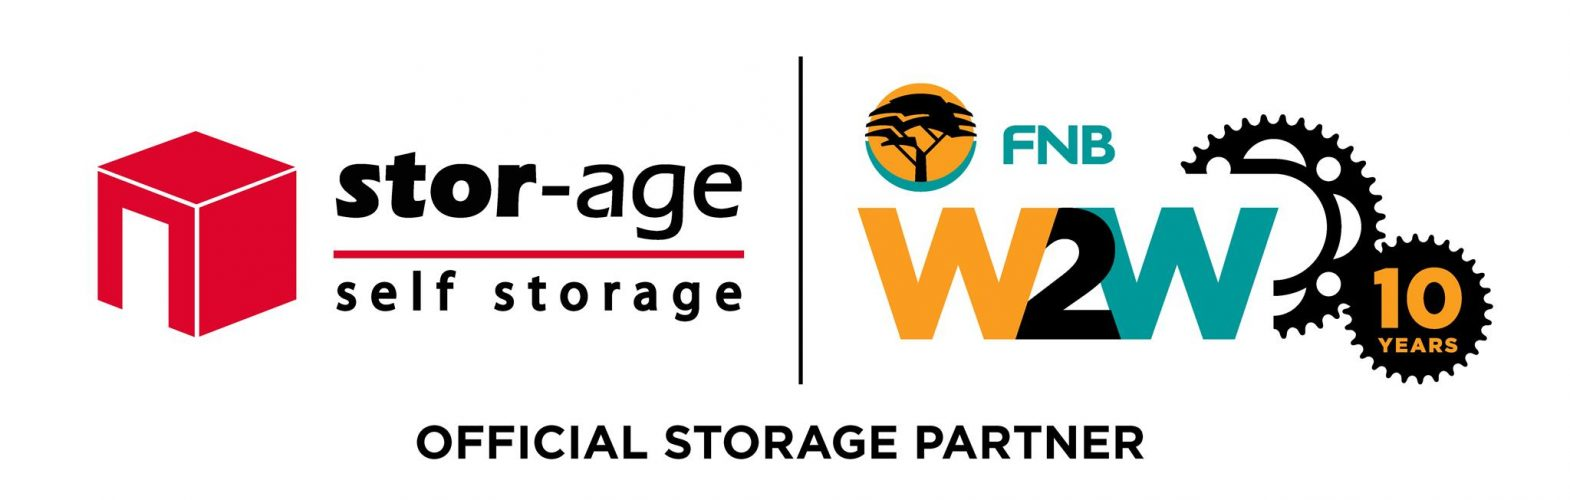 W2W_Composite_Stor-Age